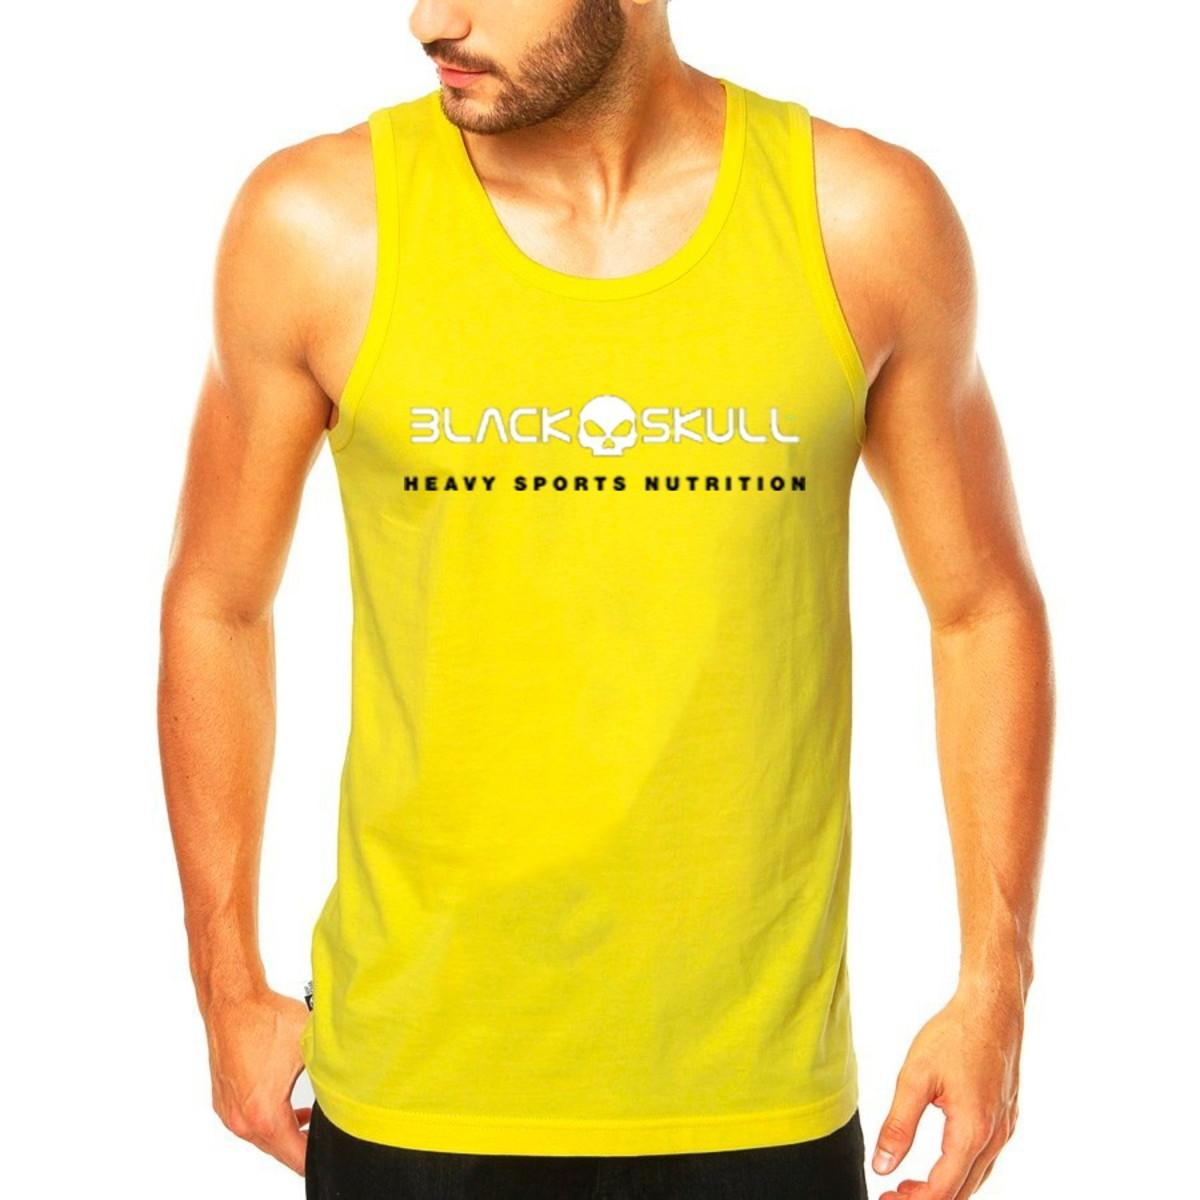 df4644319a Camiseta Regata Black Skull Heavy Sports Nutrition no Elo7